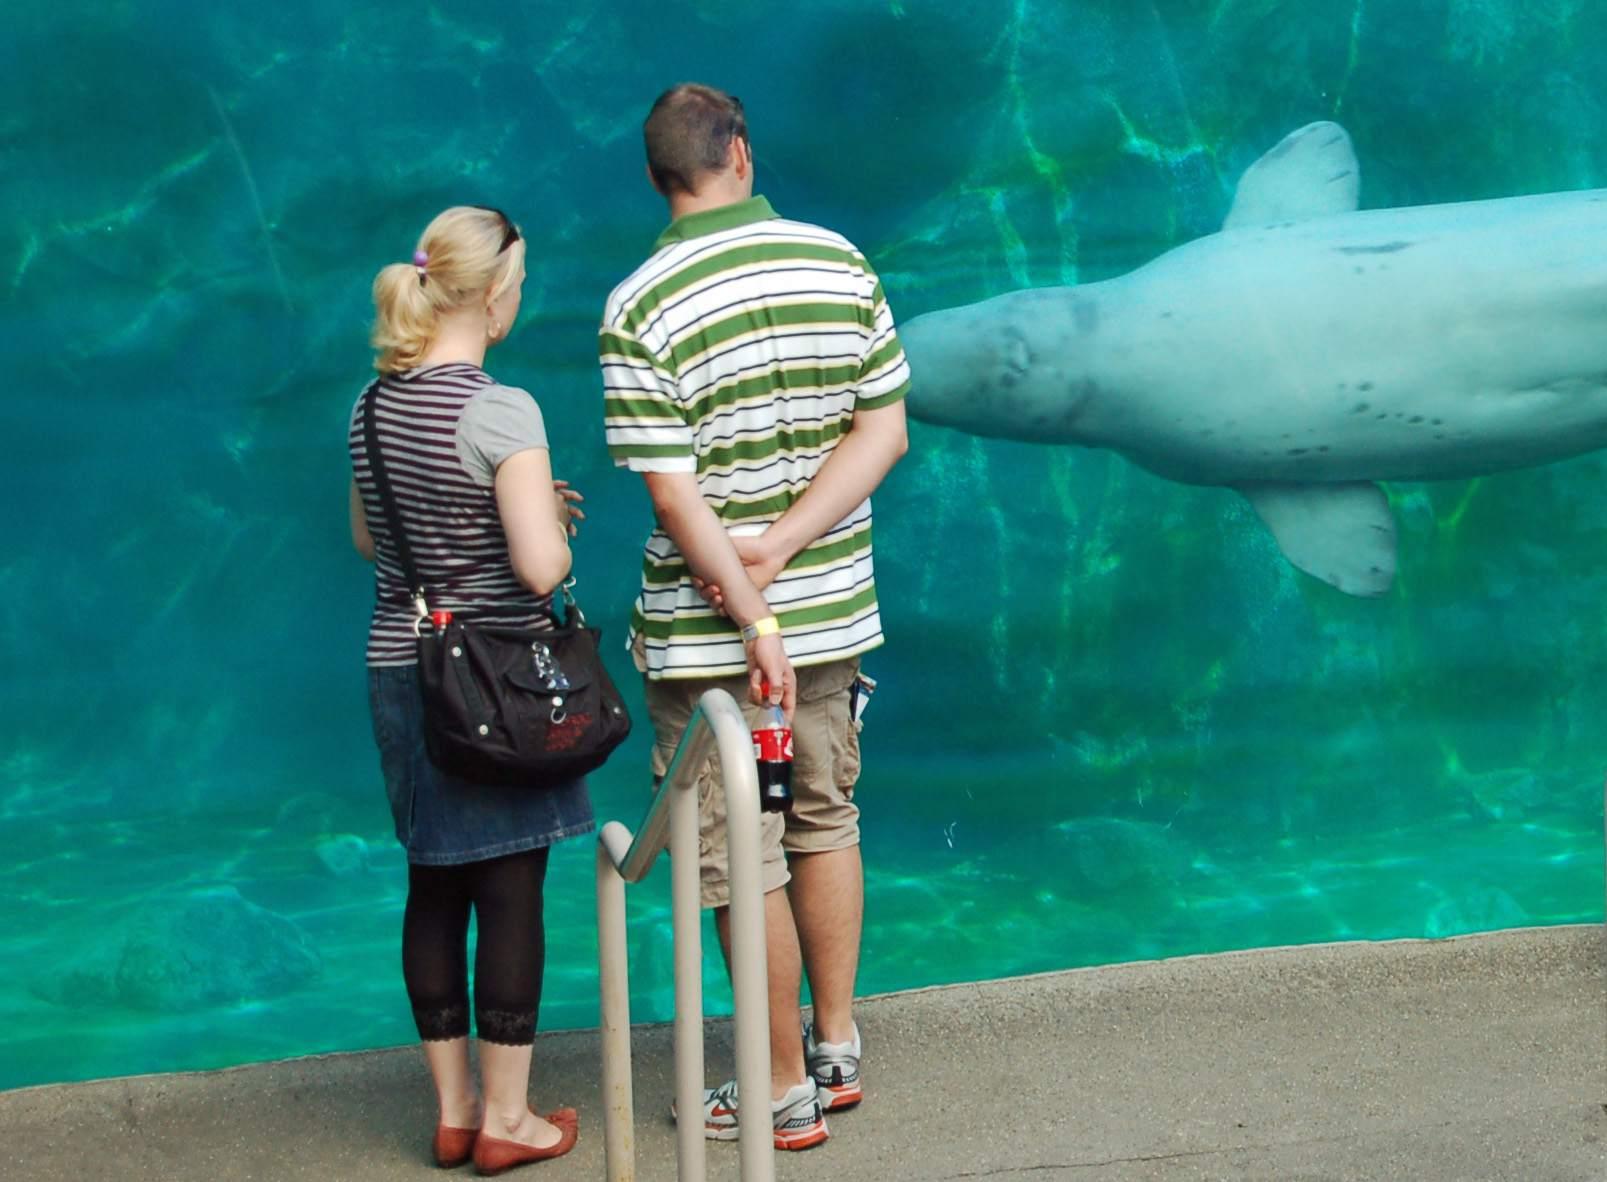 A couple enjoying the Mystic Aquarium